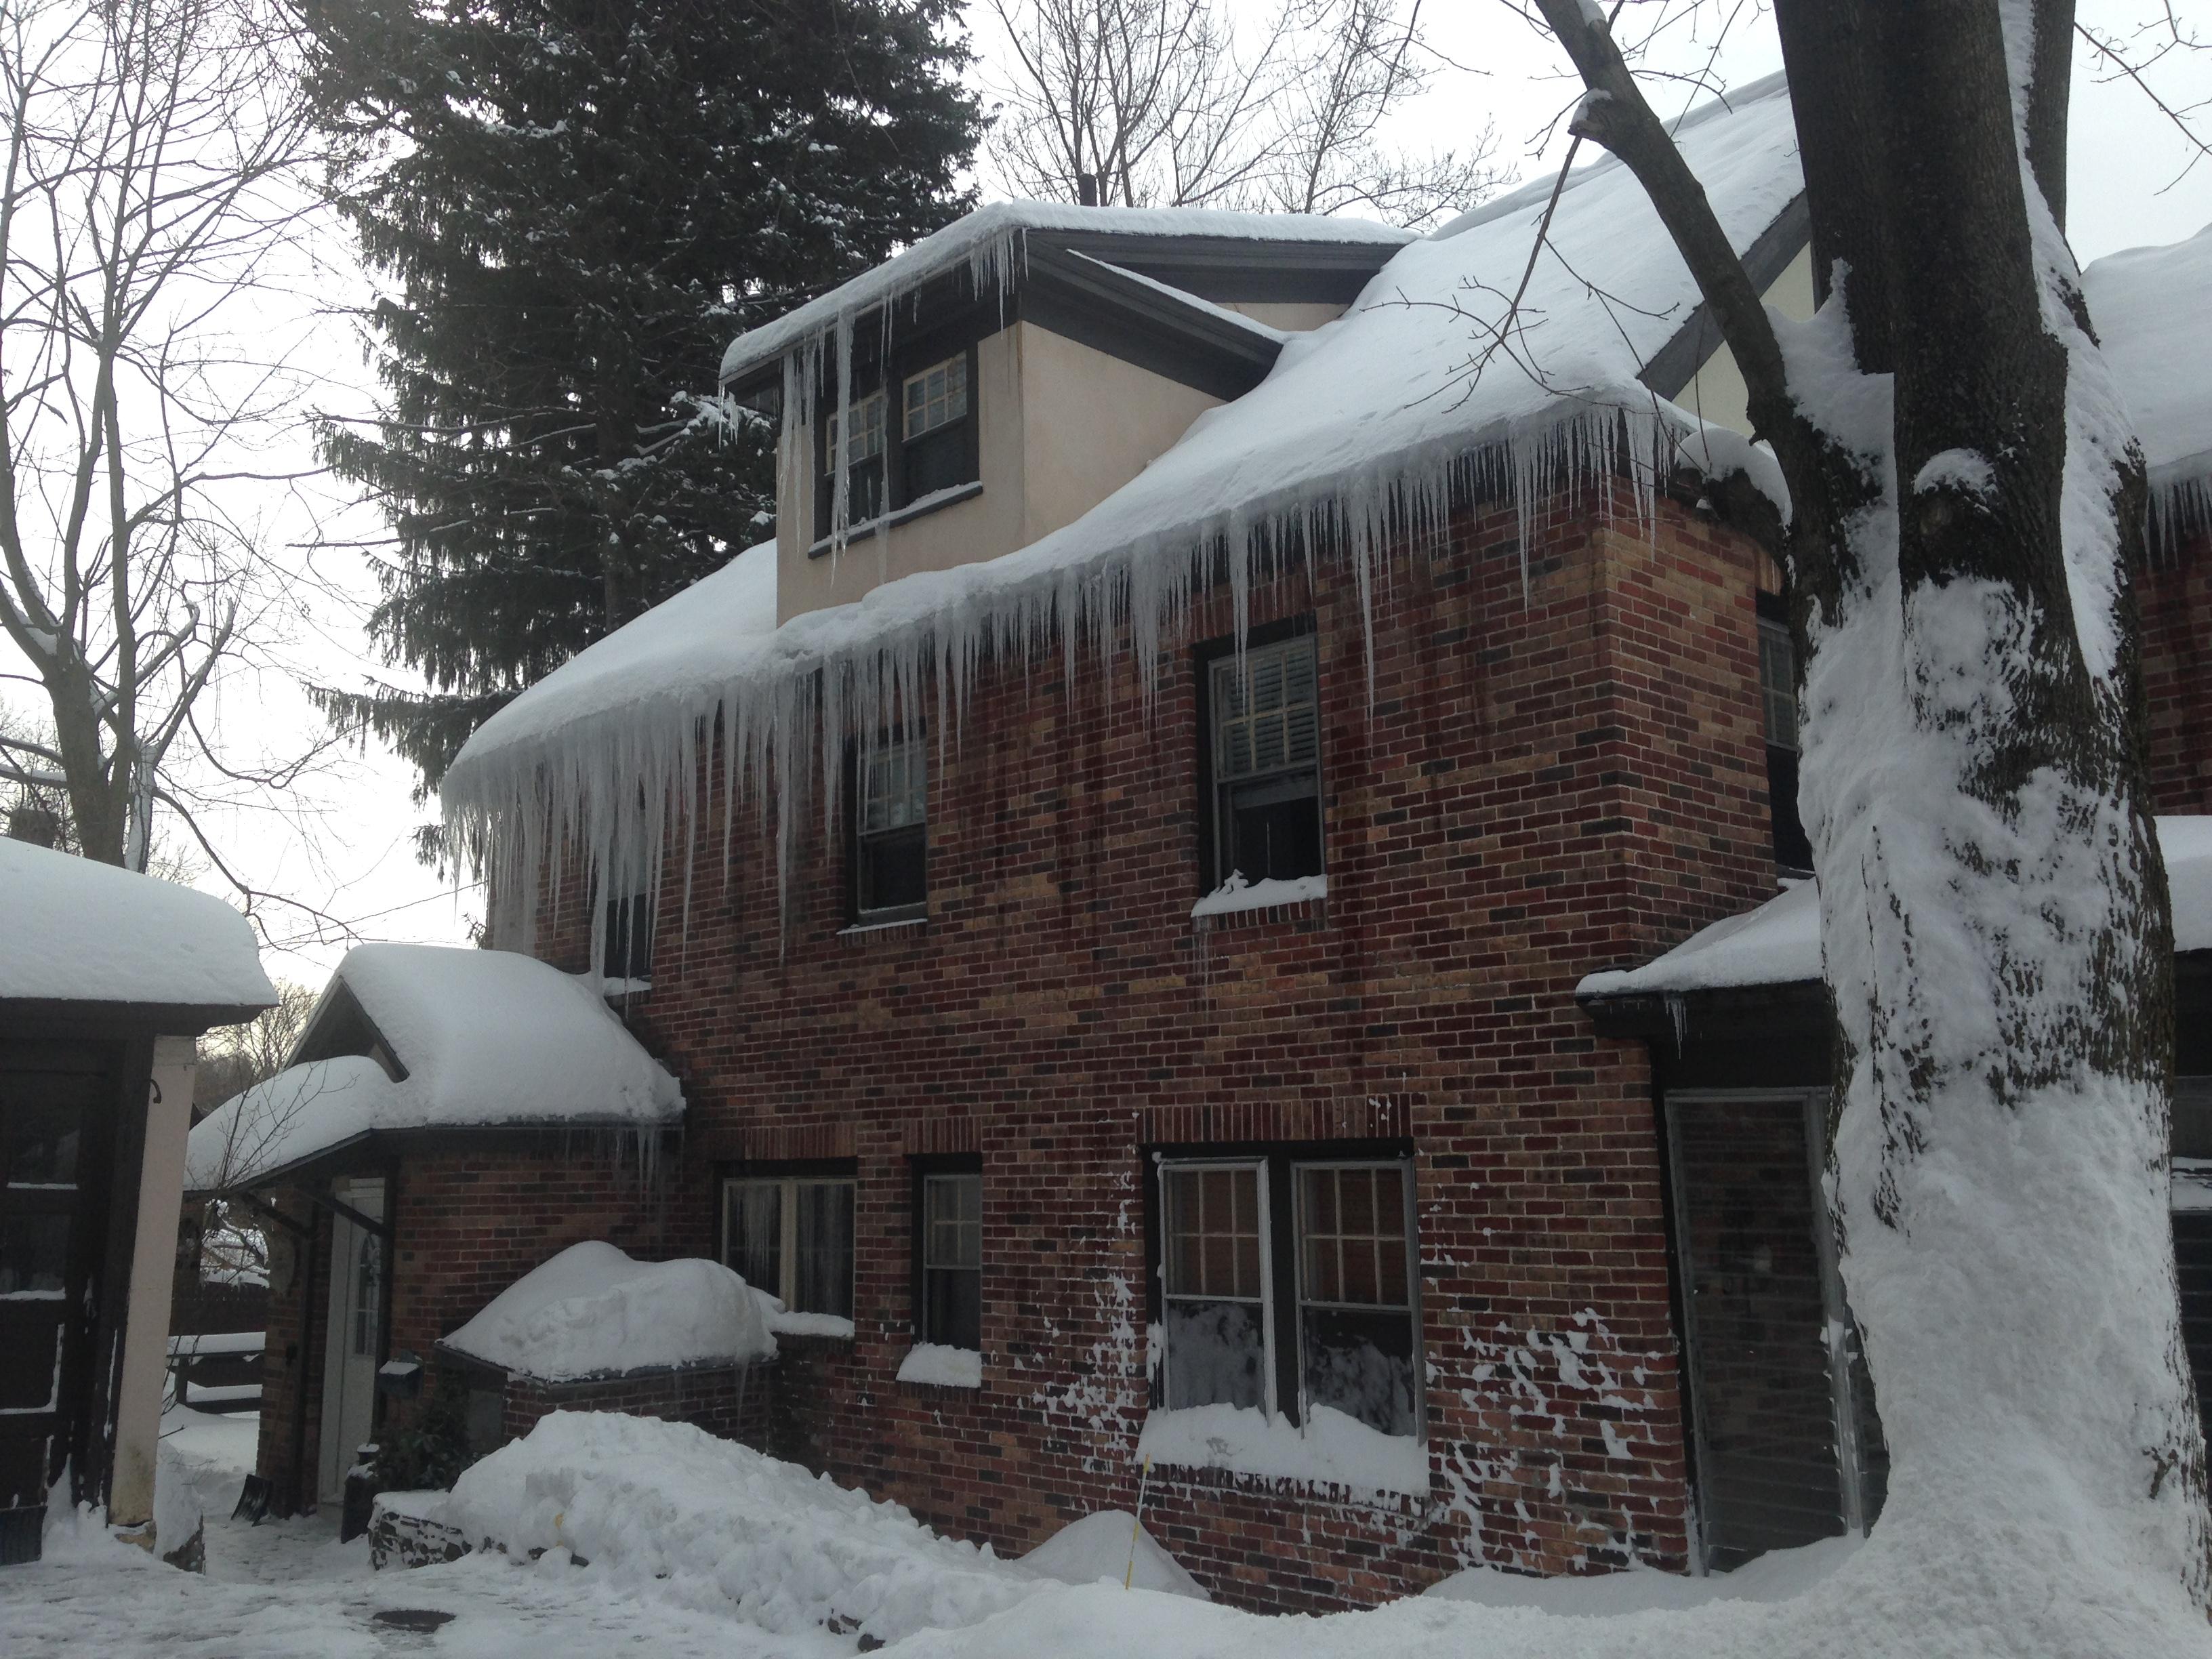 Ice dam, insurance claim workshop